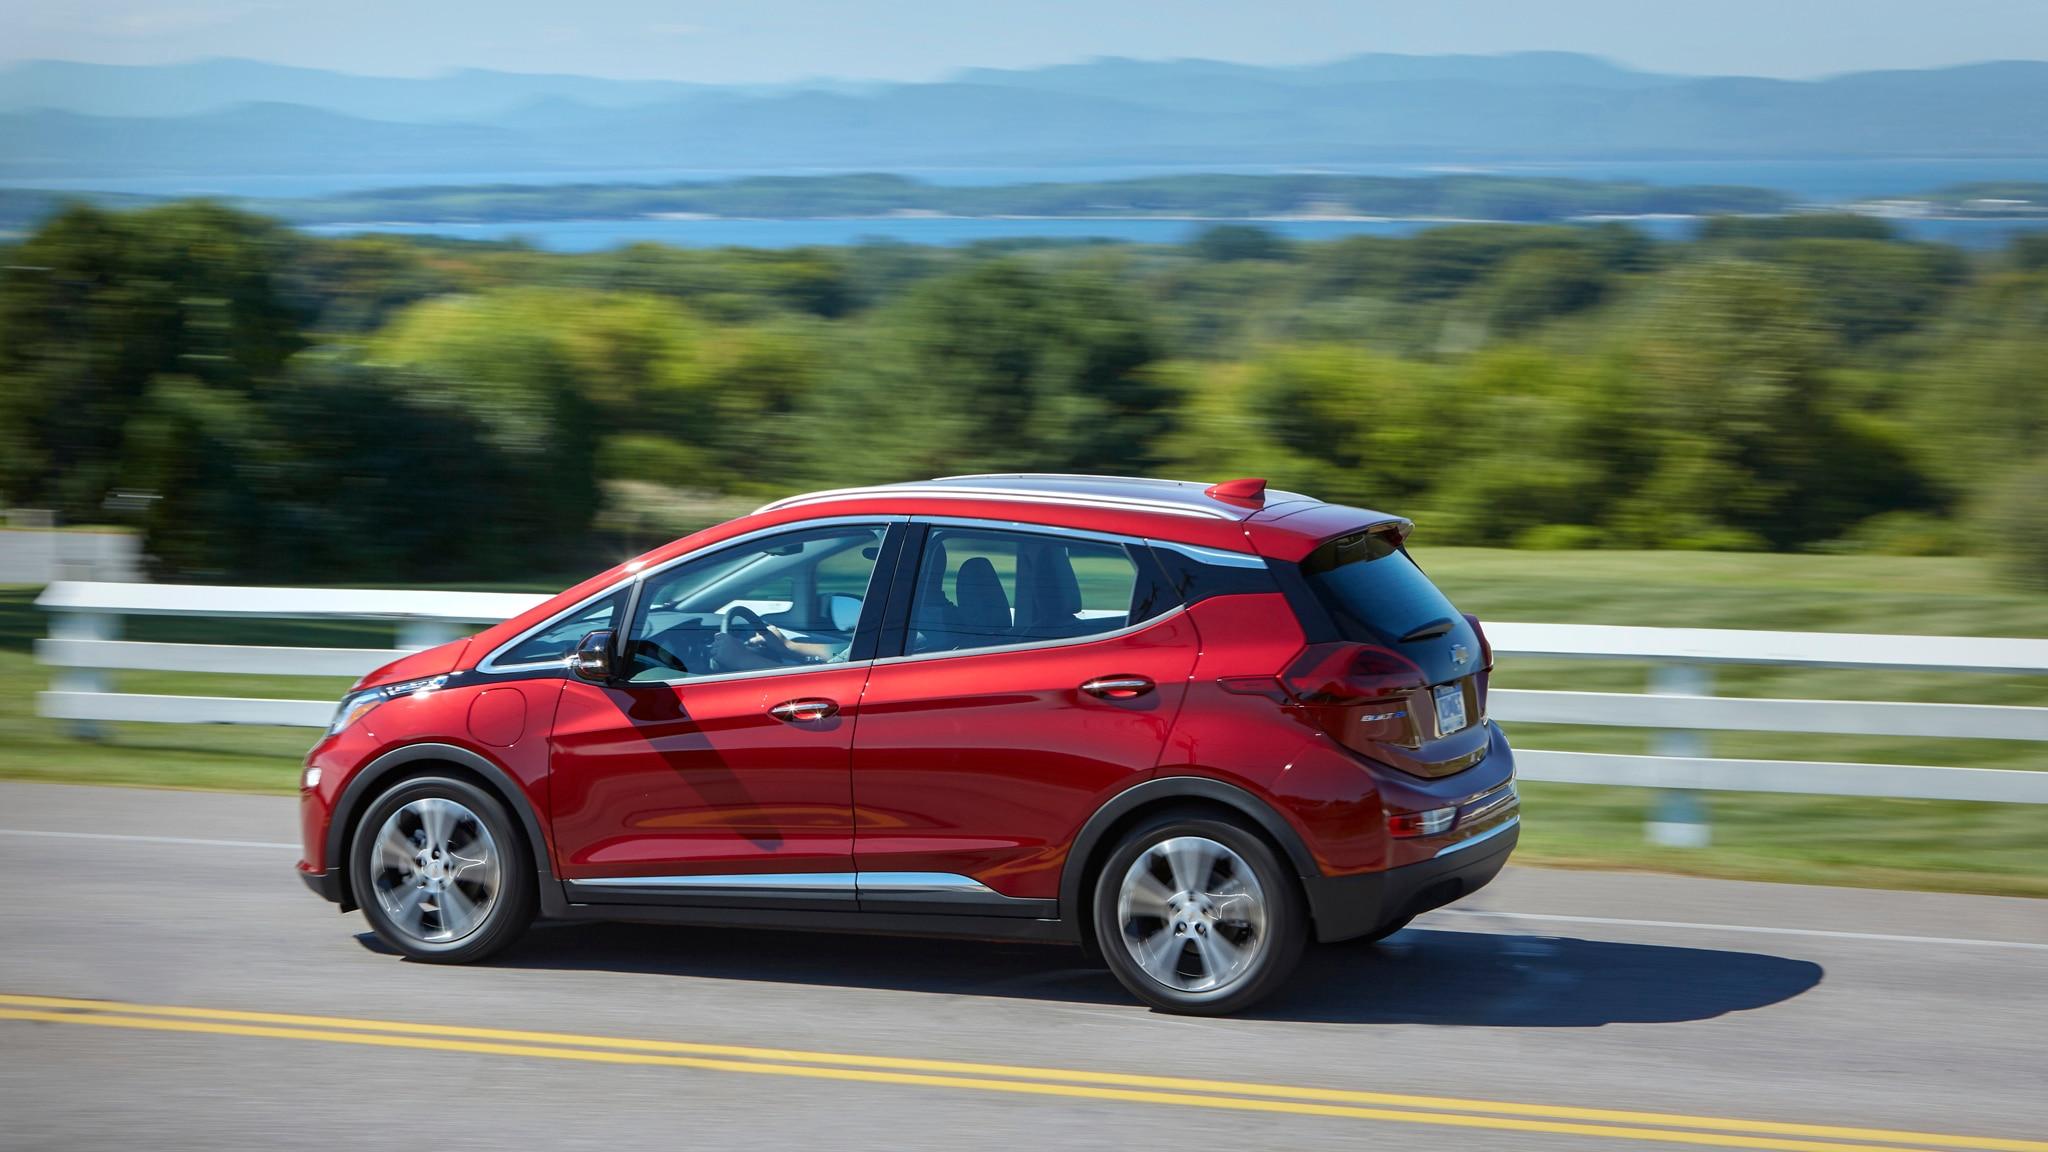 2019 Chevrolet Bolt EV and 2019 Chevrolet Volt PHEV Review